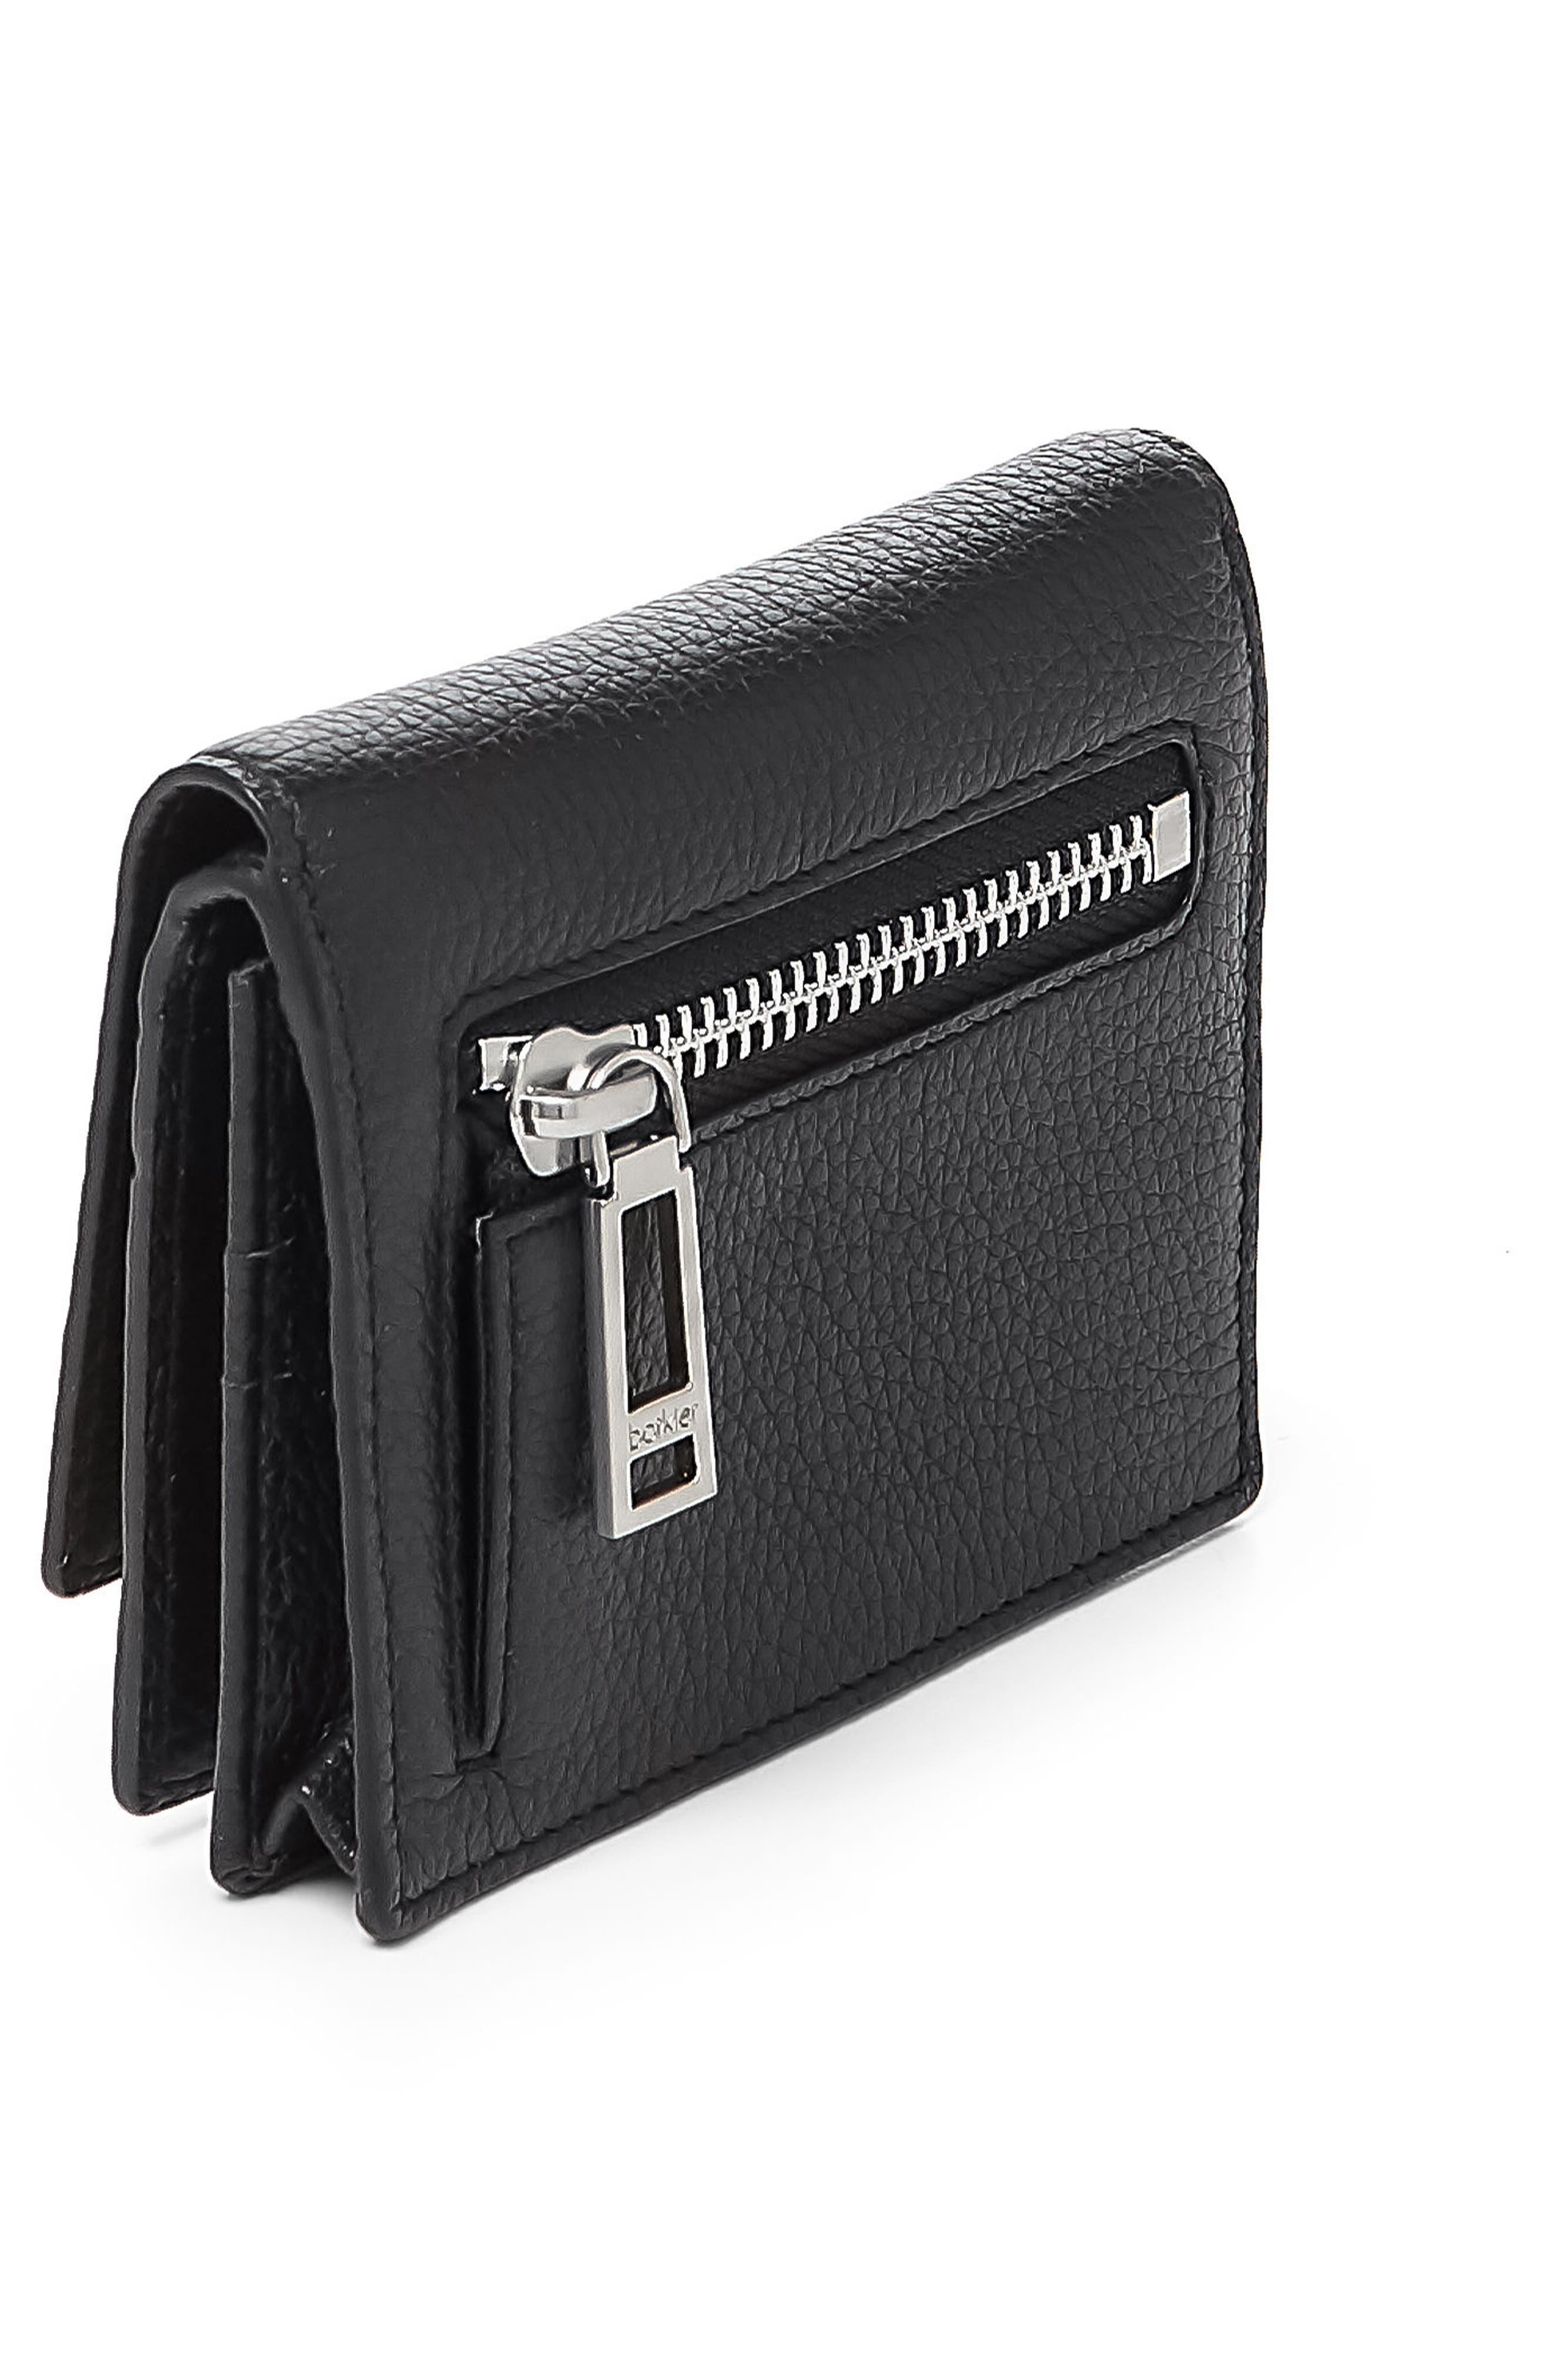 Soho Mini Leather Wallet,                             Alternate thumbnail 3, color,                             001